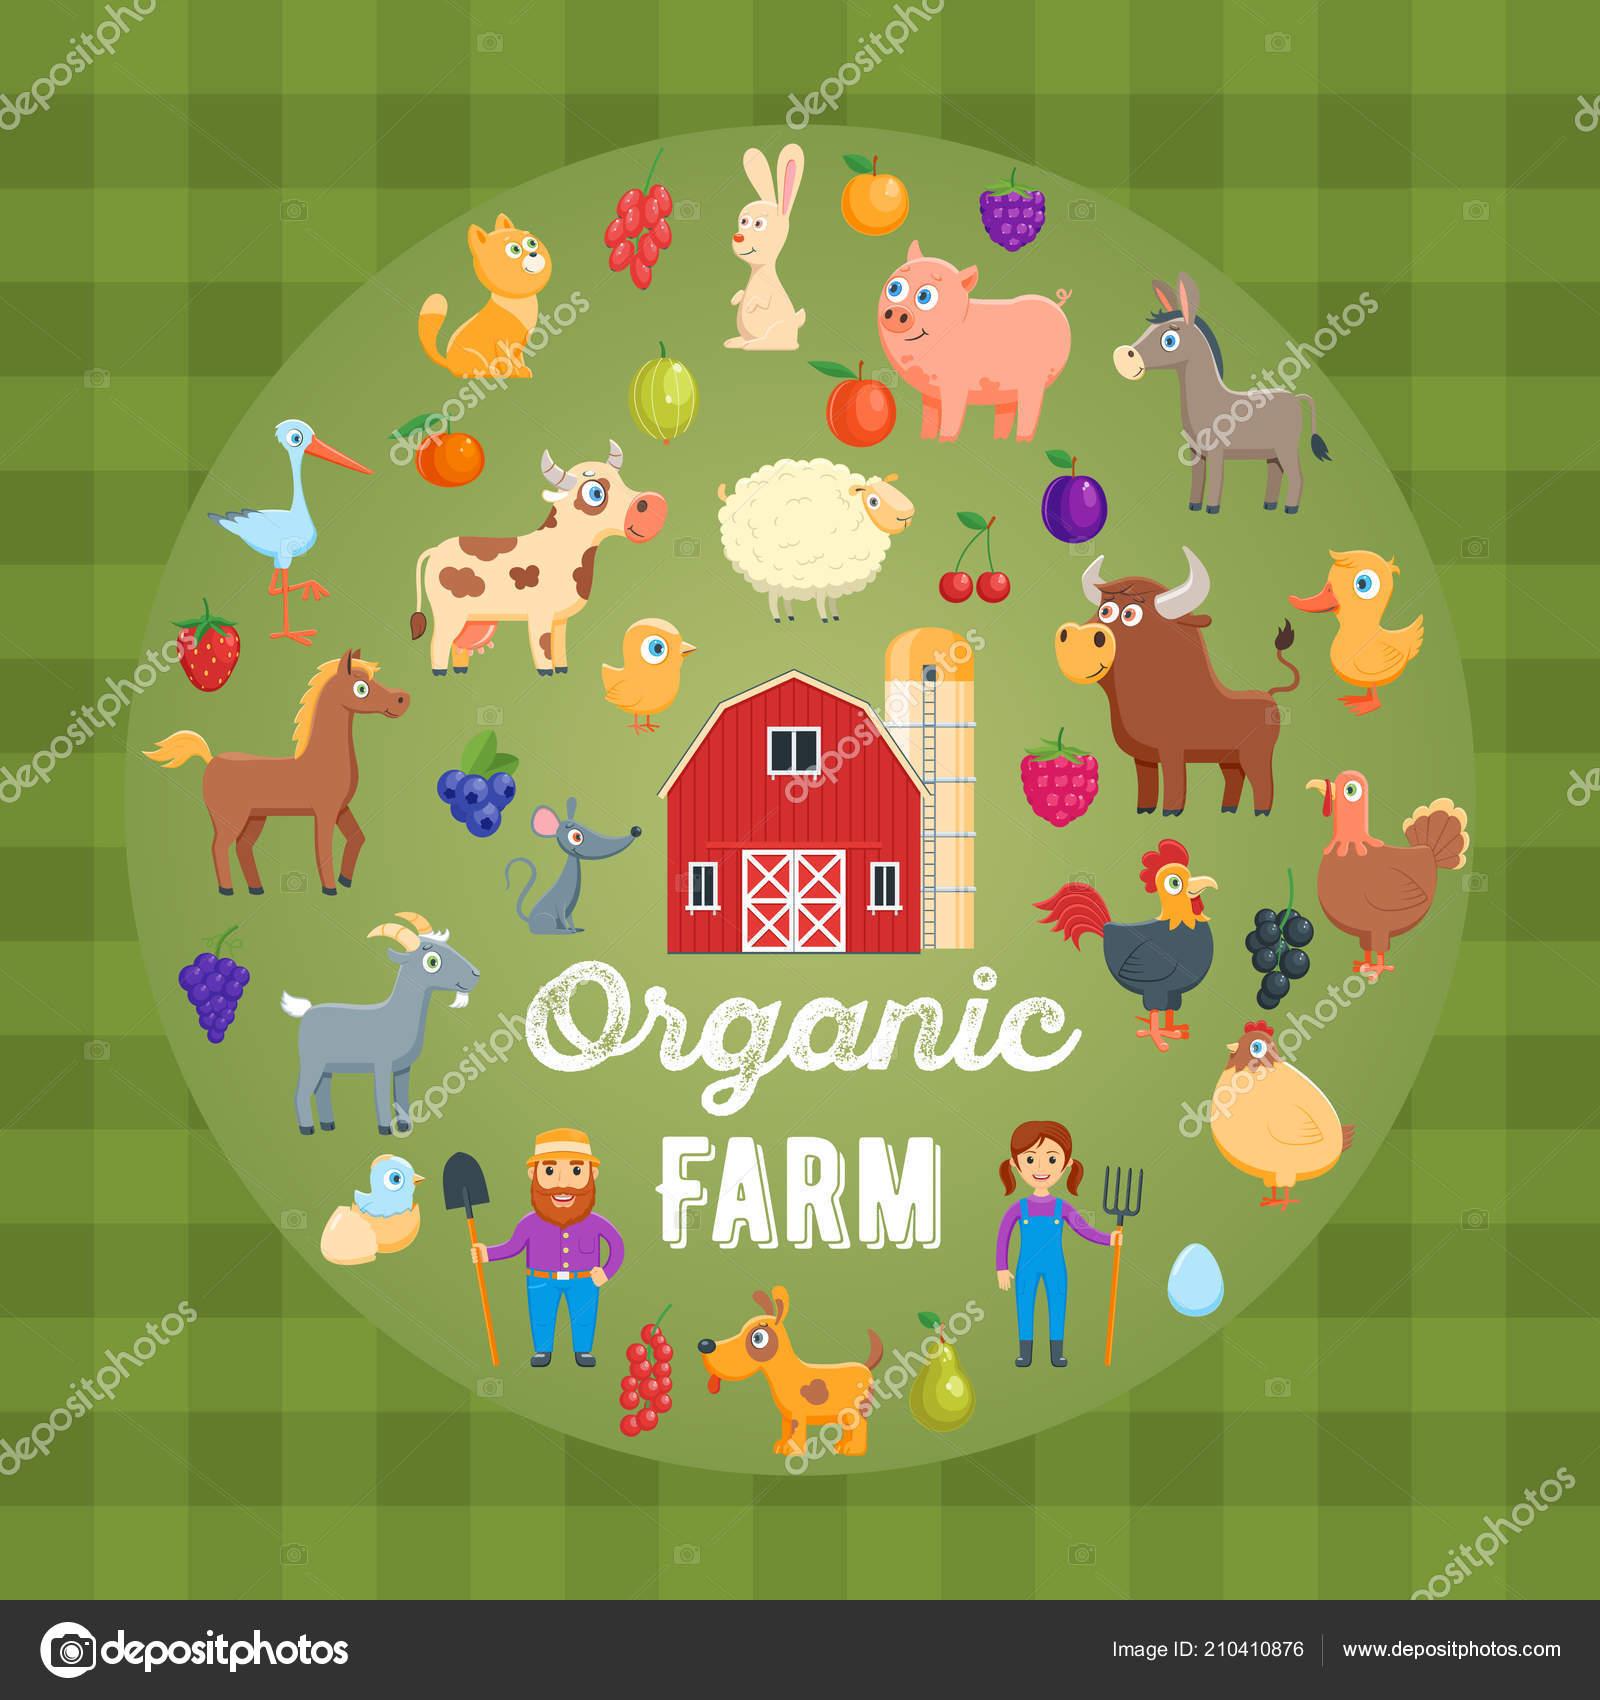 organic farm concept cartoon images poultry farm animals farmers